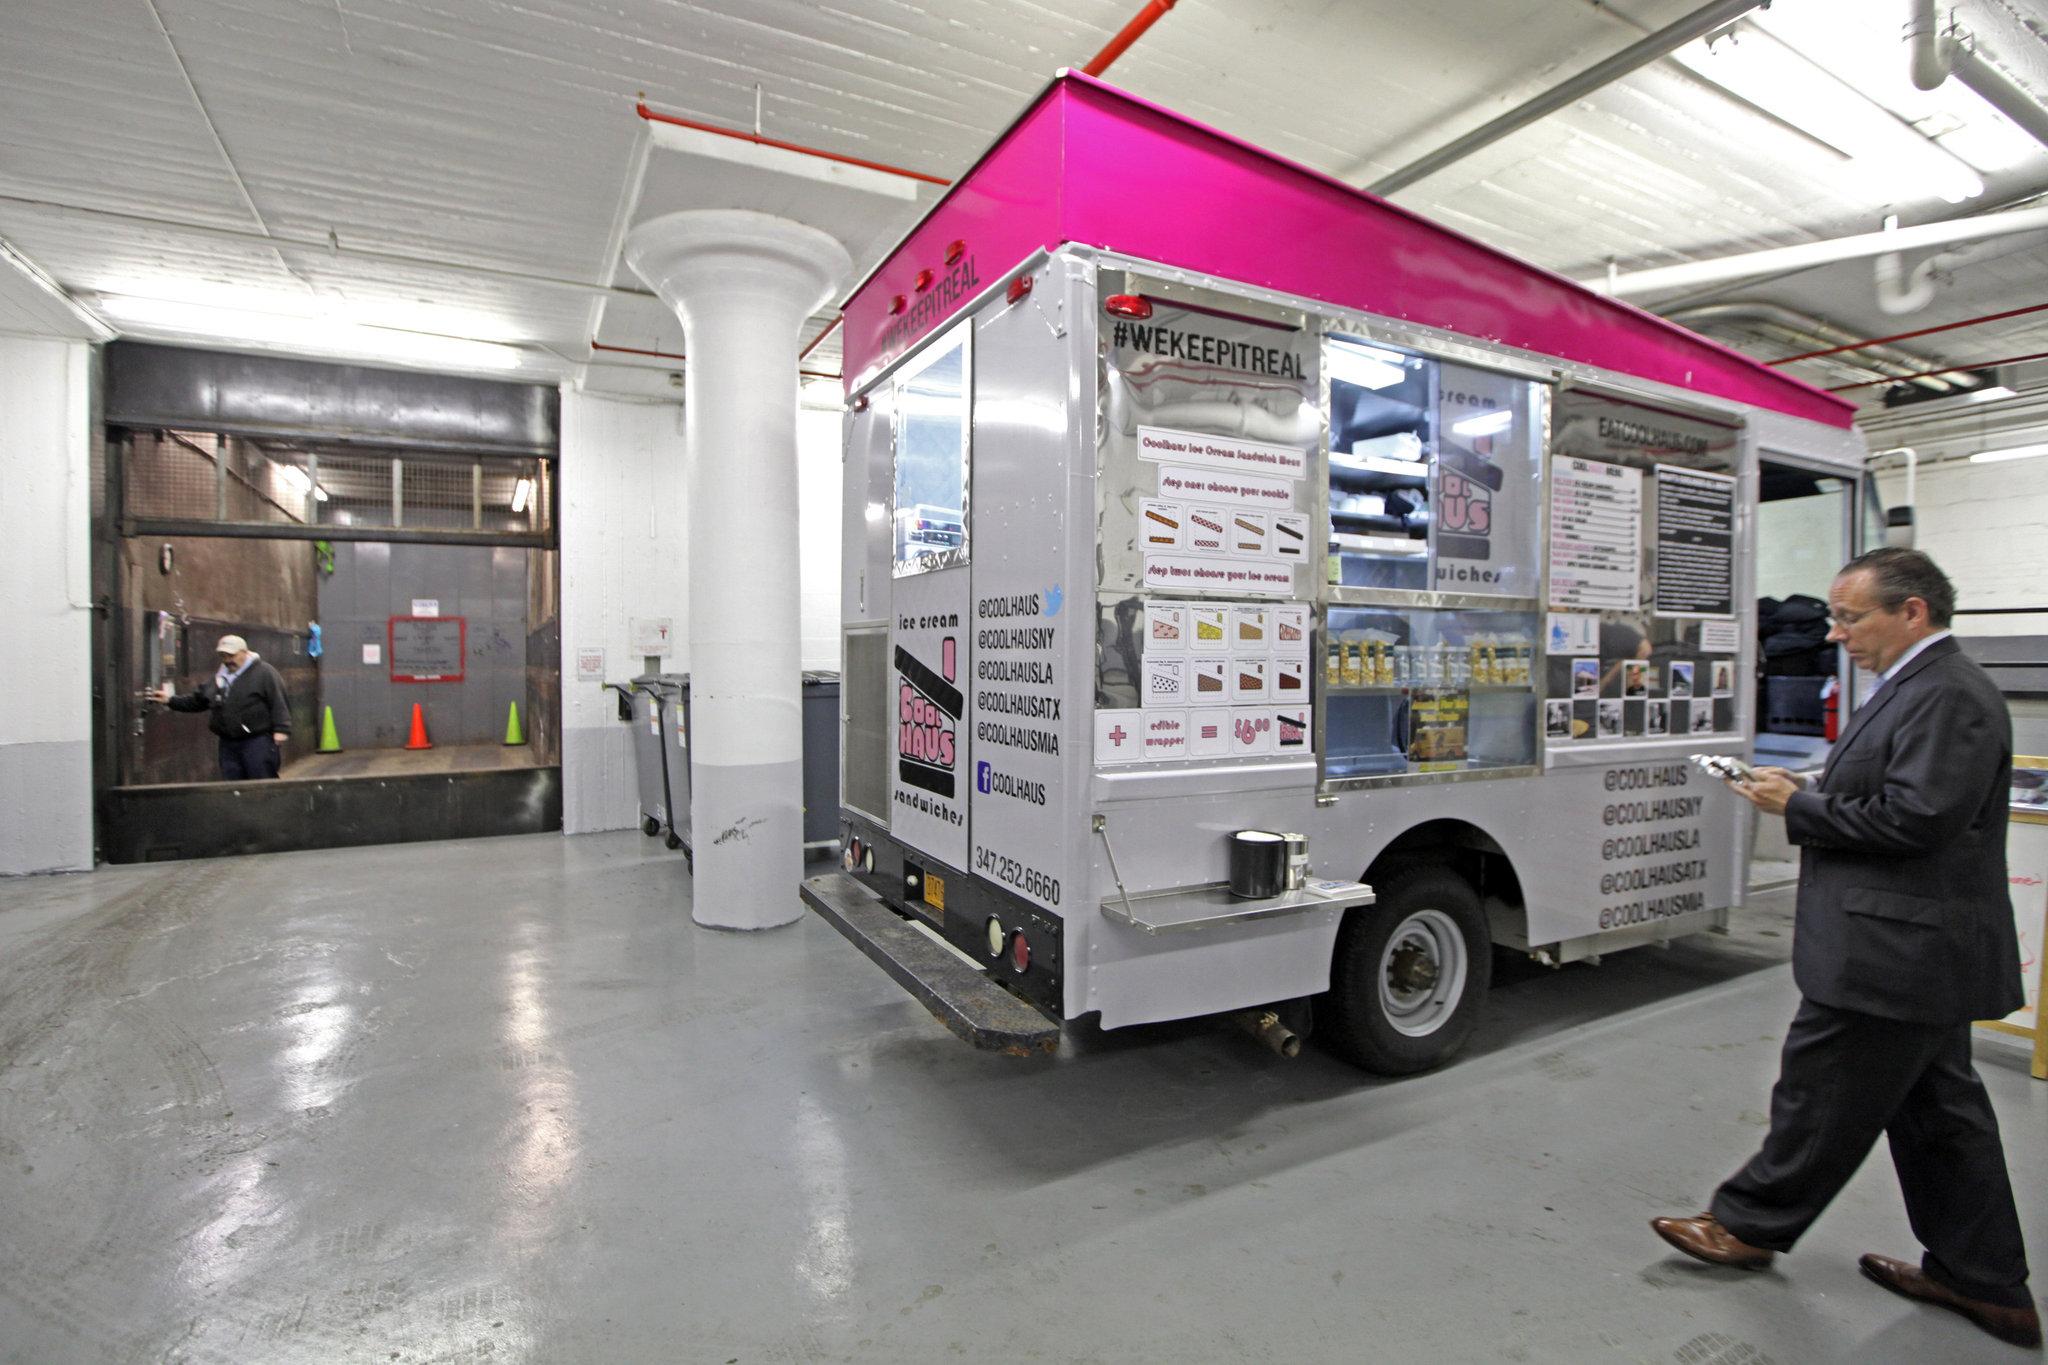 Food Trucks Serve a Chelsea Buildings Upper Floors  The